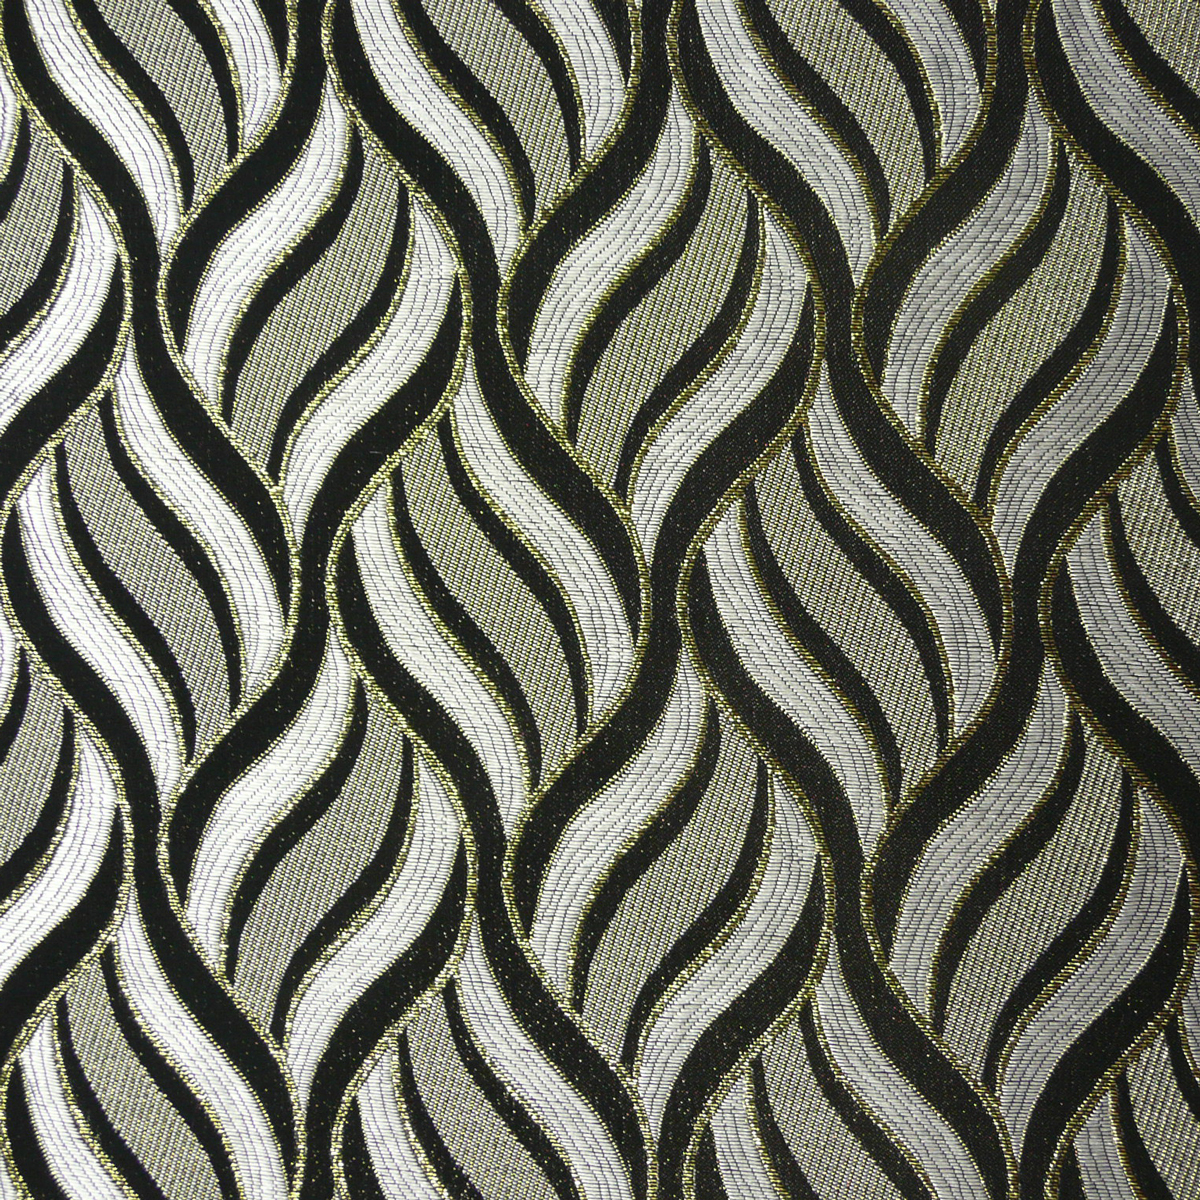 Lurex Jacquard Stoff Wellen weiß grau goldfarbig Glitzer